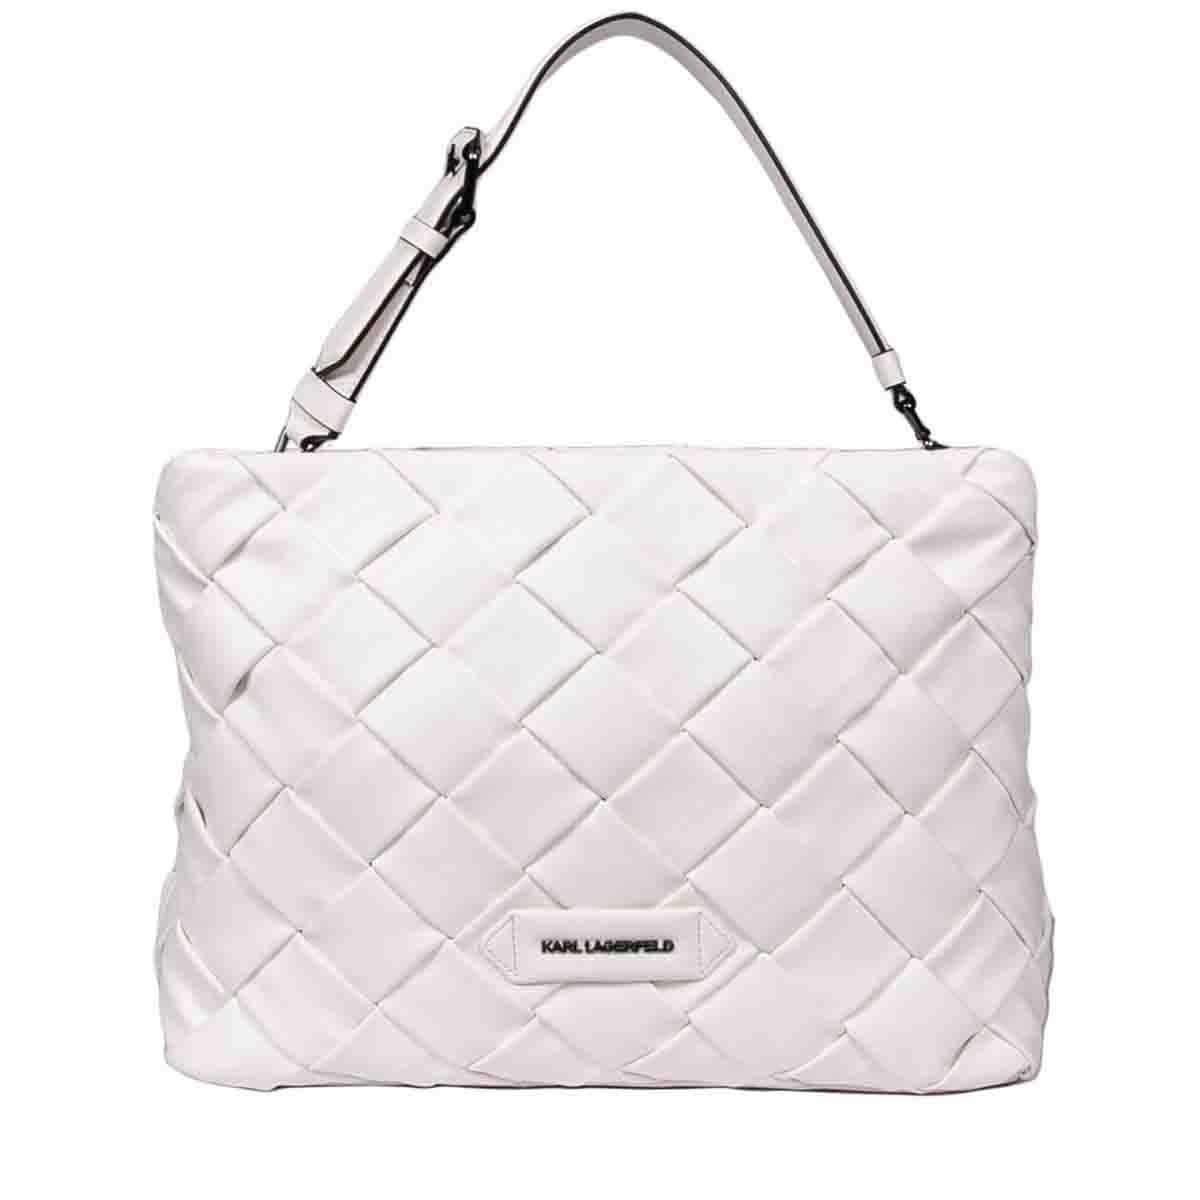 Karl Lagerfeld K/KUSHION SHOULDER BAG